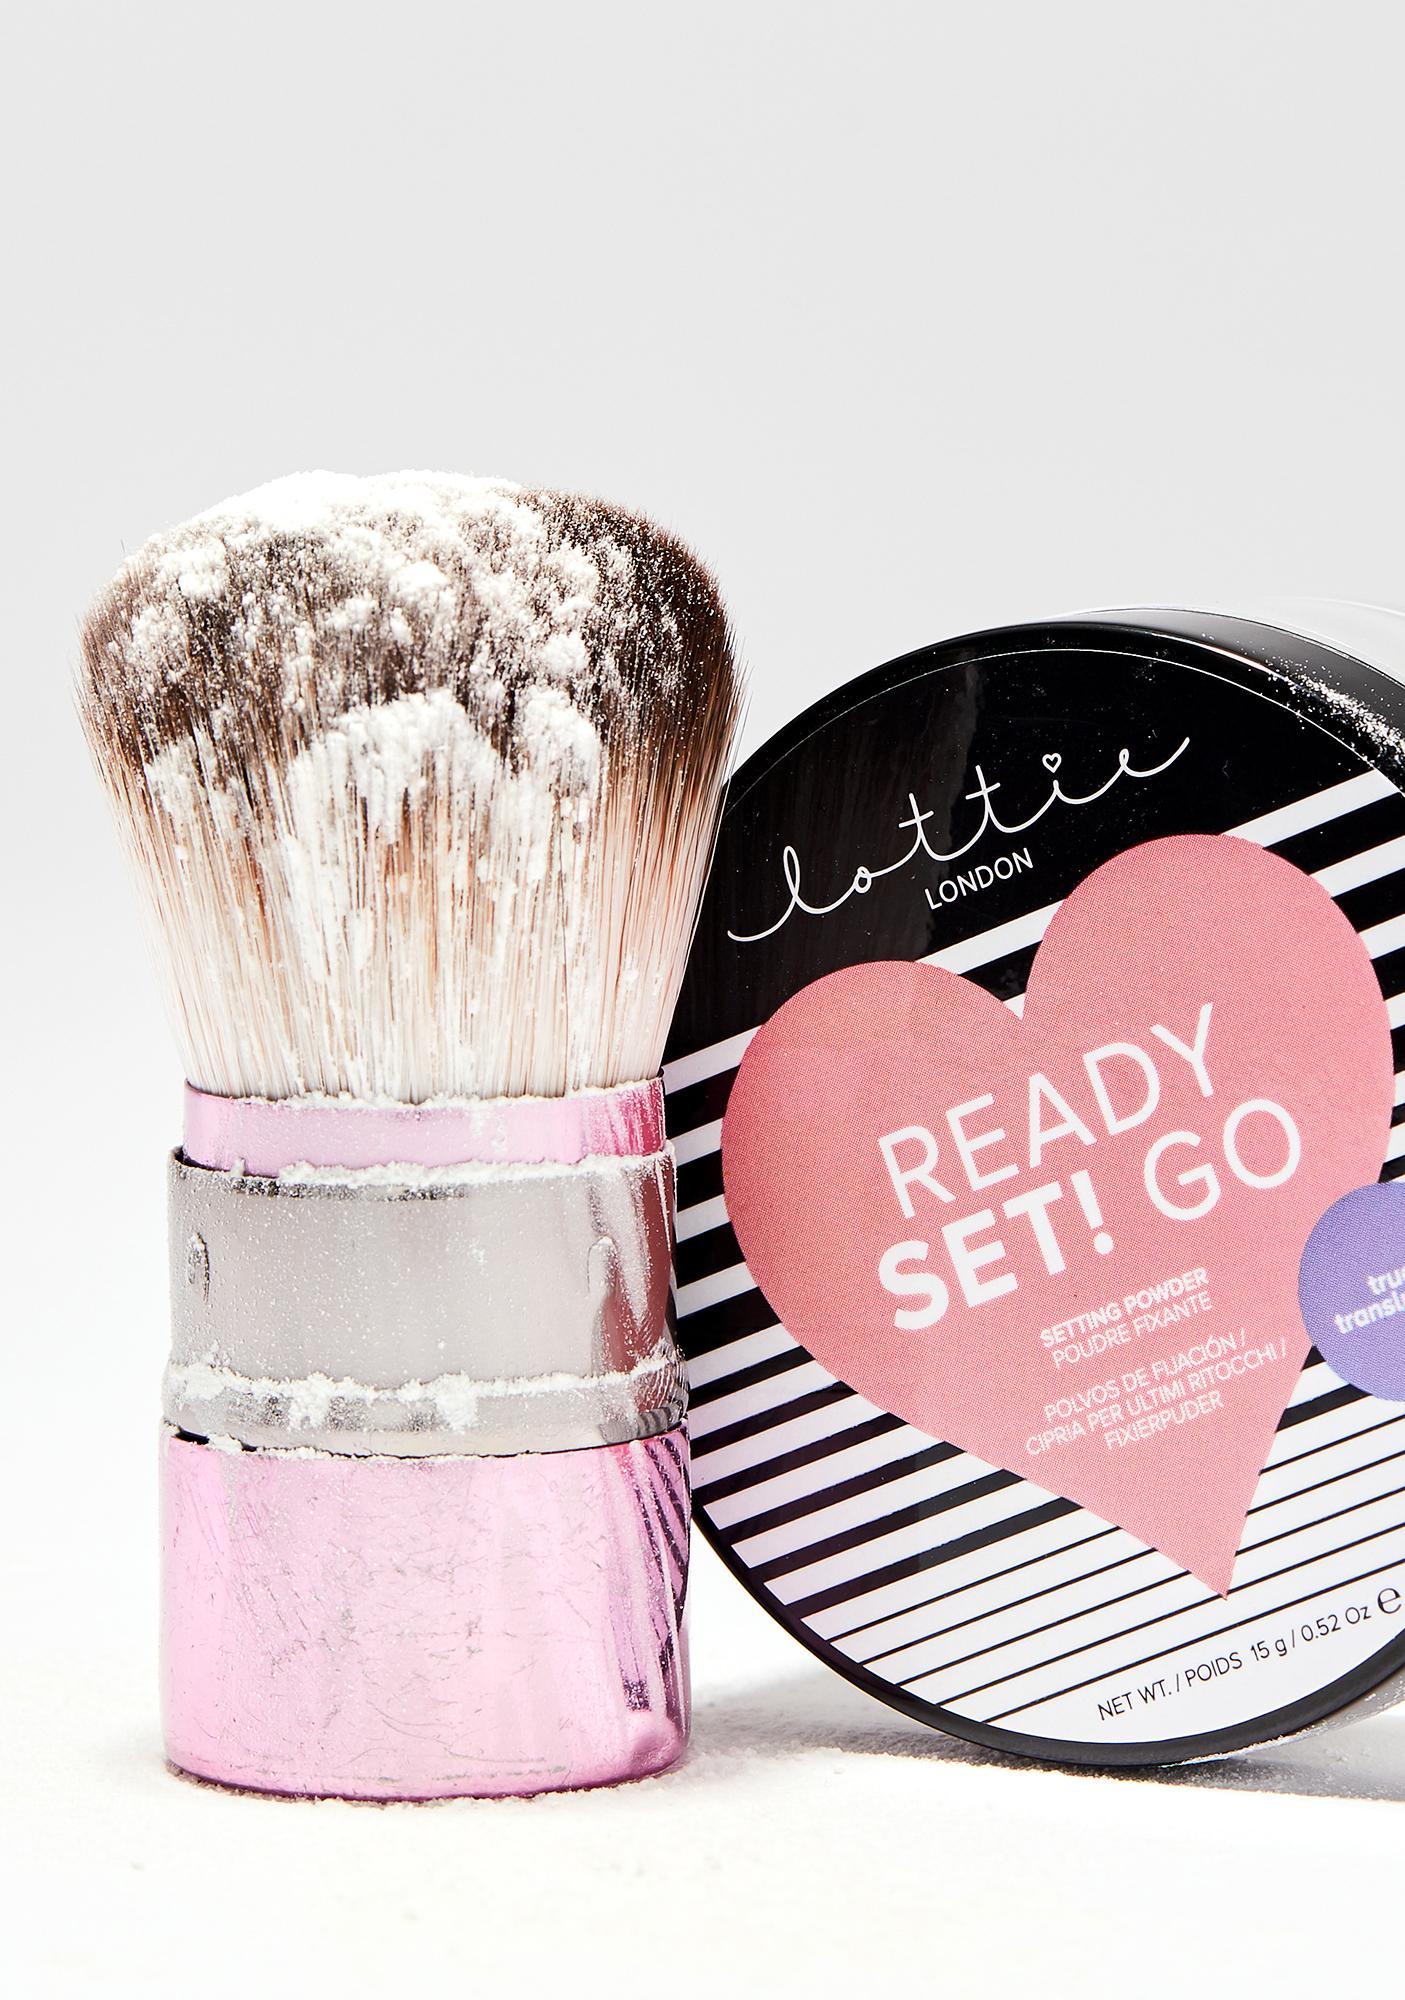 Lottie London Ready Set! Go Translucent Setting Powder